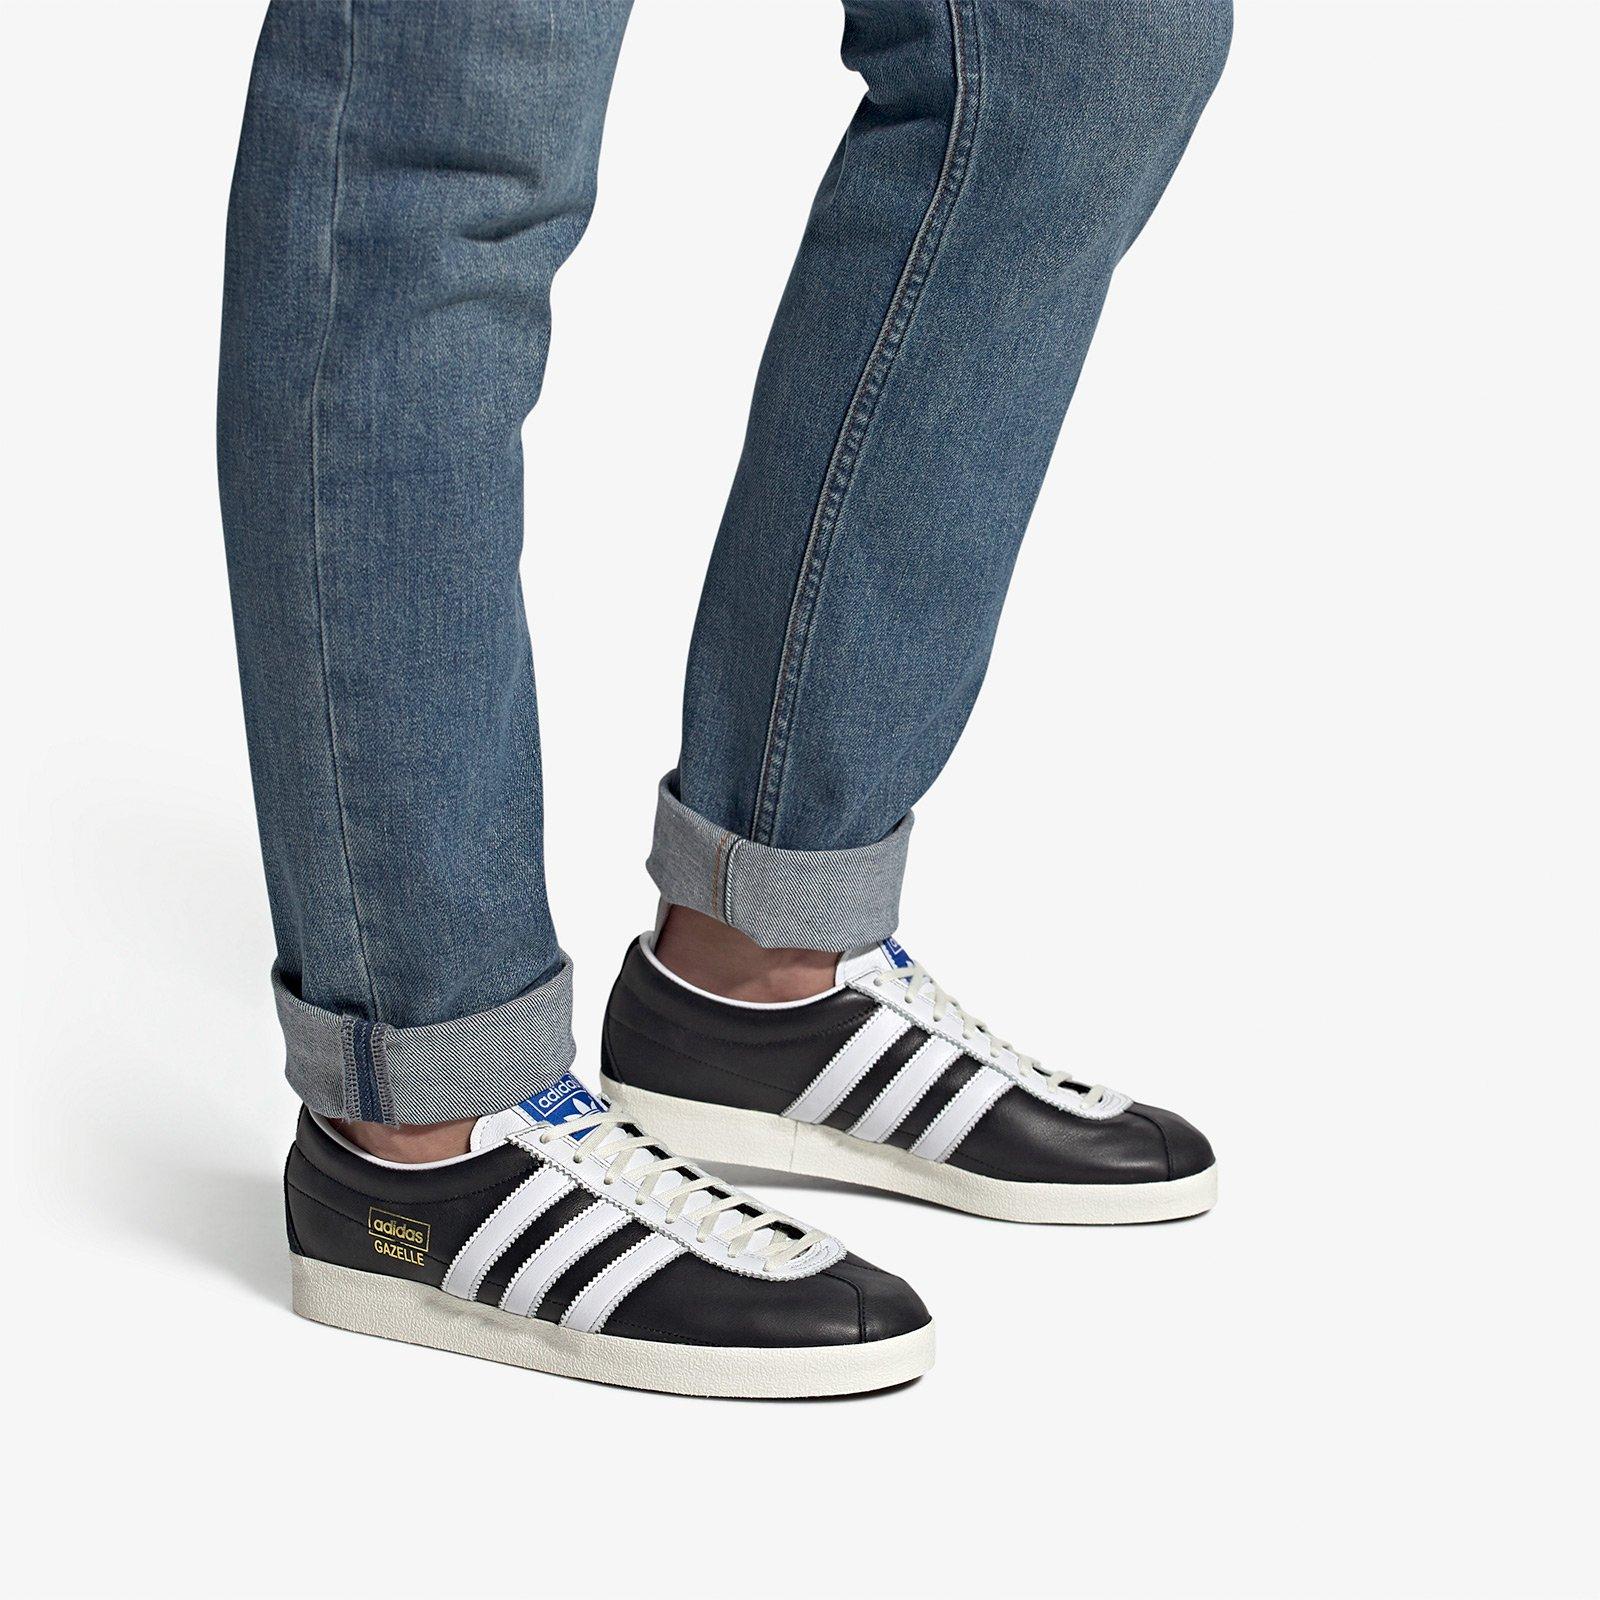 adidas Gazelle Vintage - Fu9658 - SNS | sneakers & streetwear ...